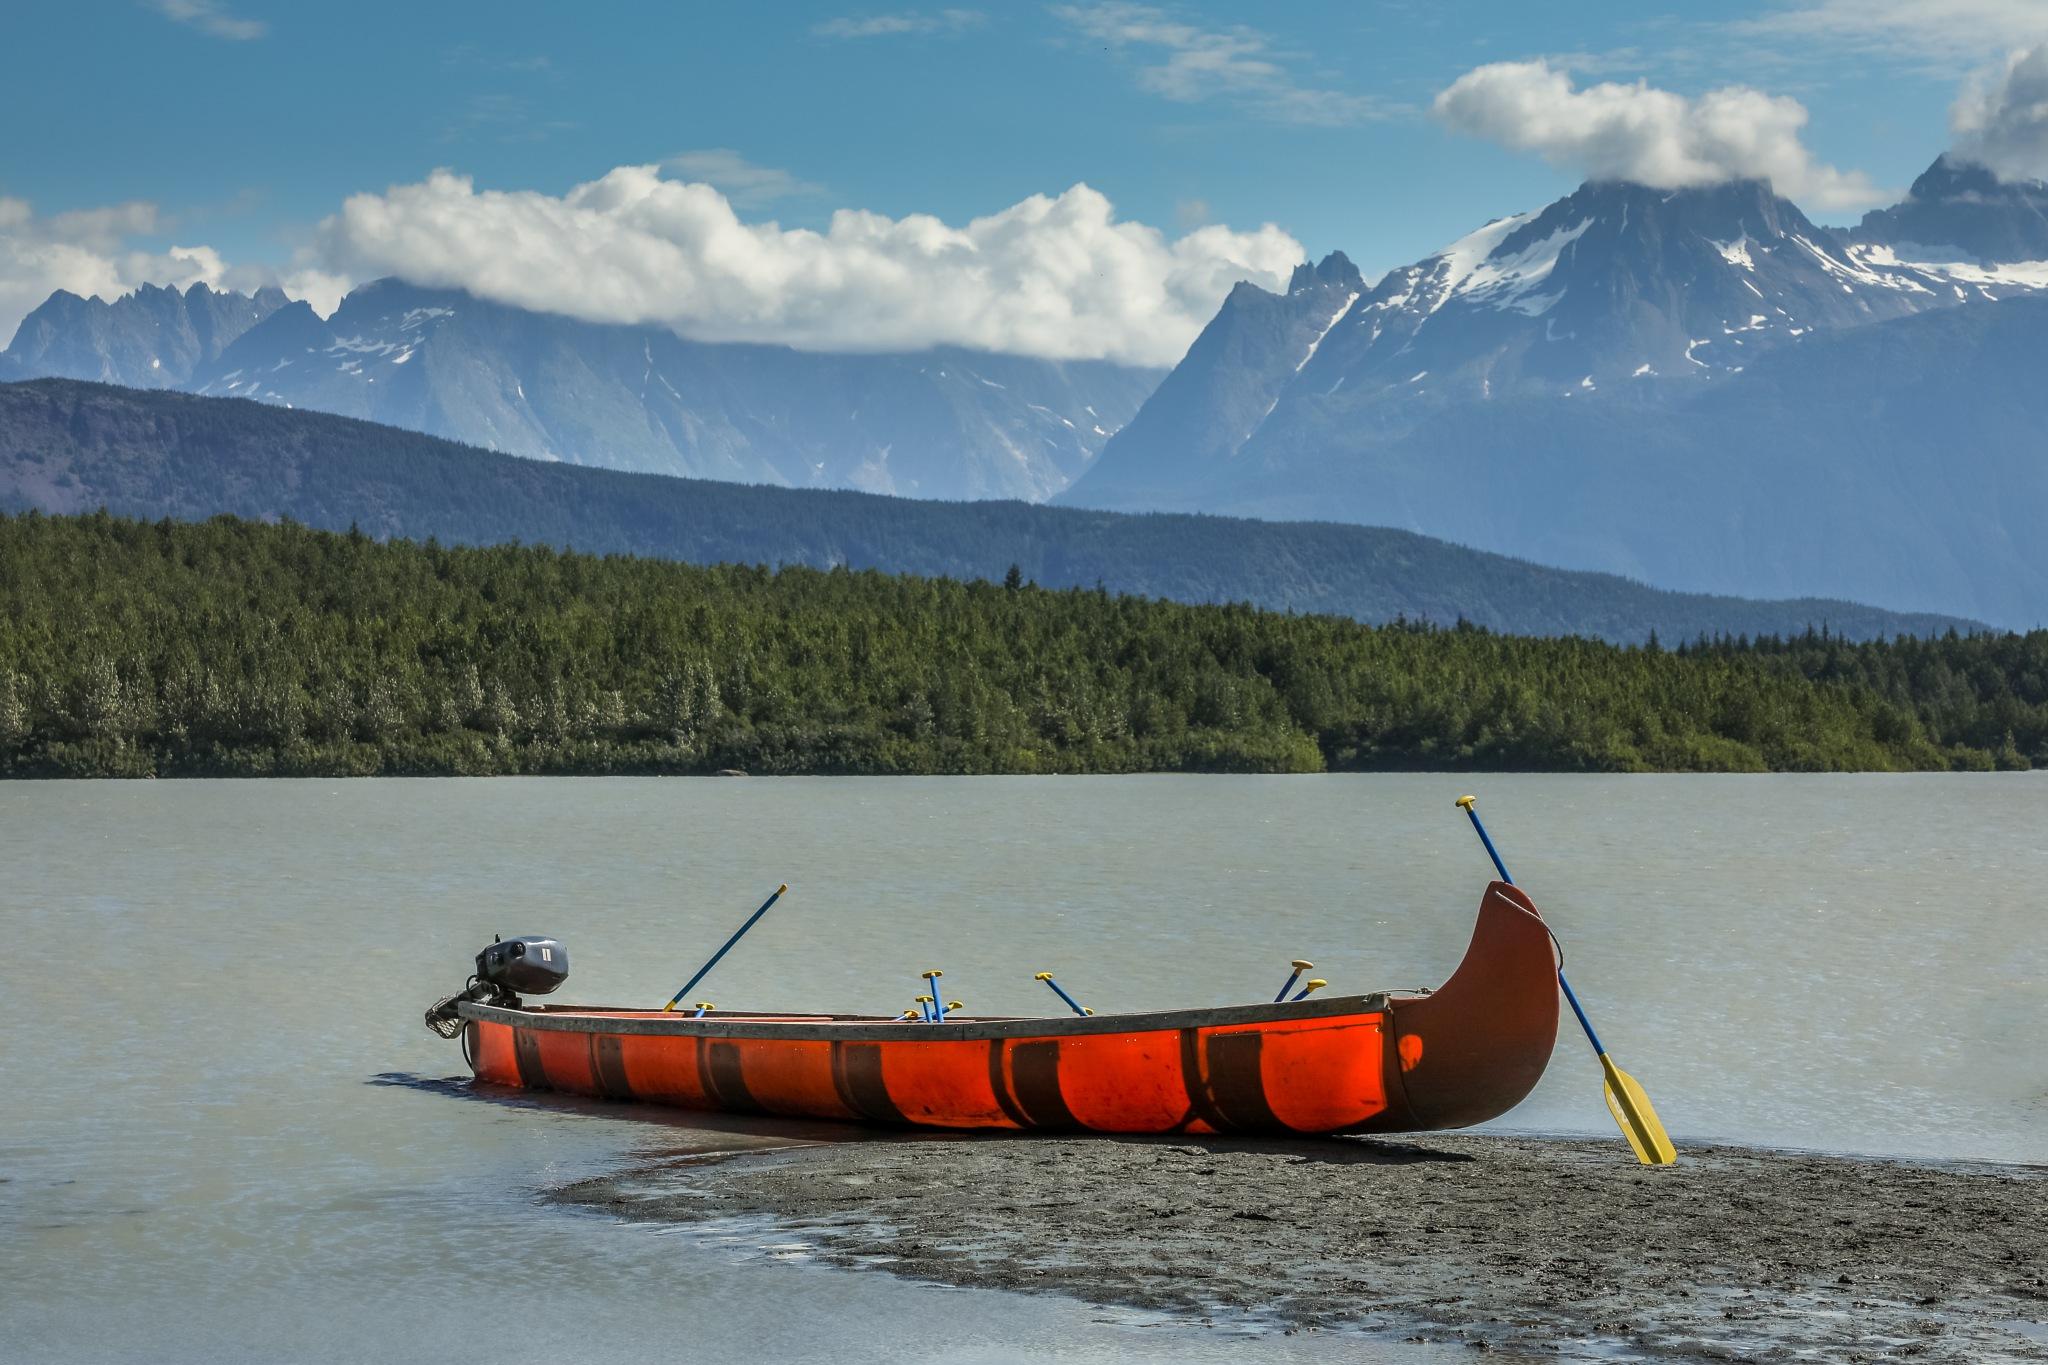 Scenic Alaska by Martina Birnbaum